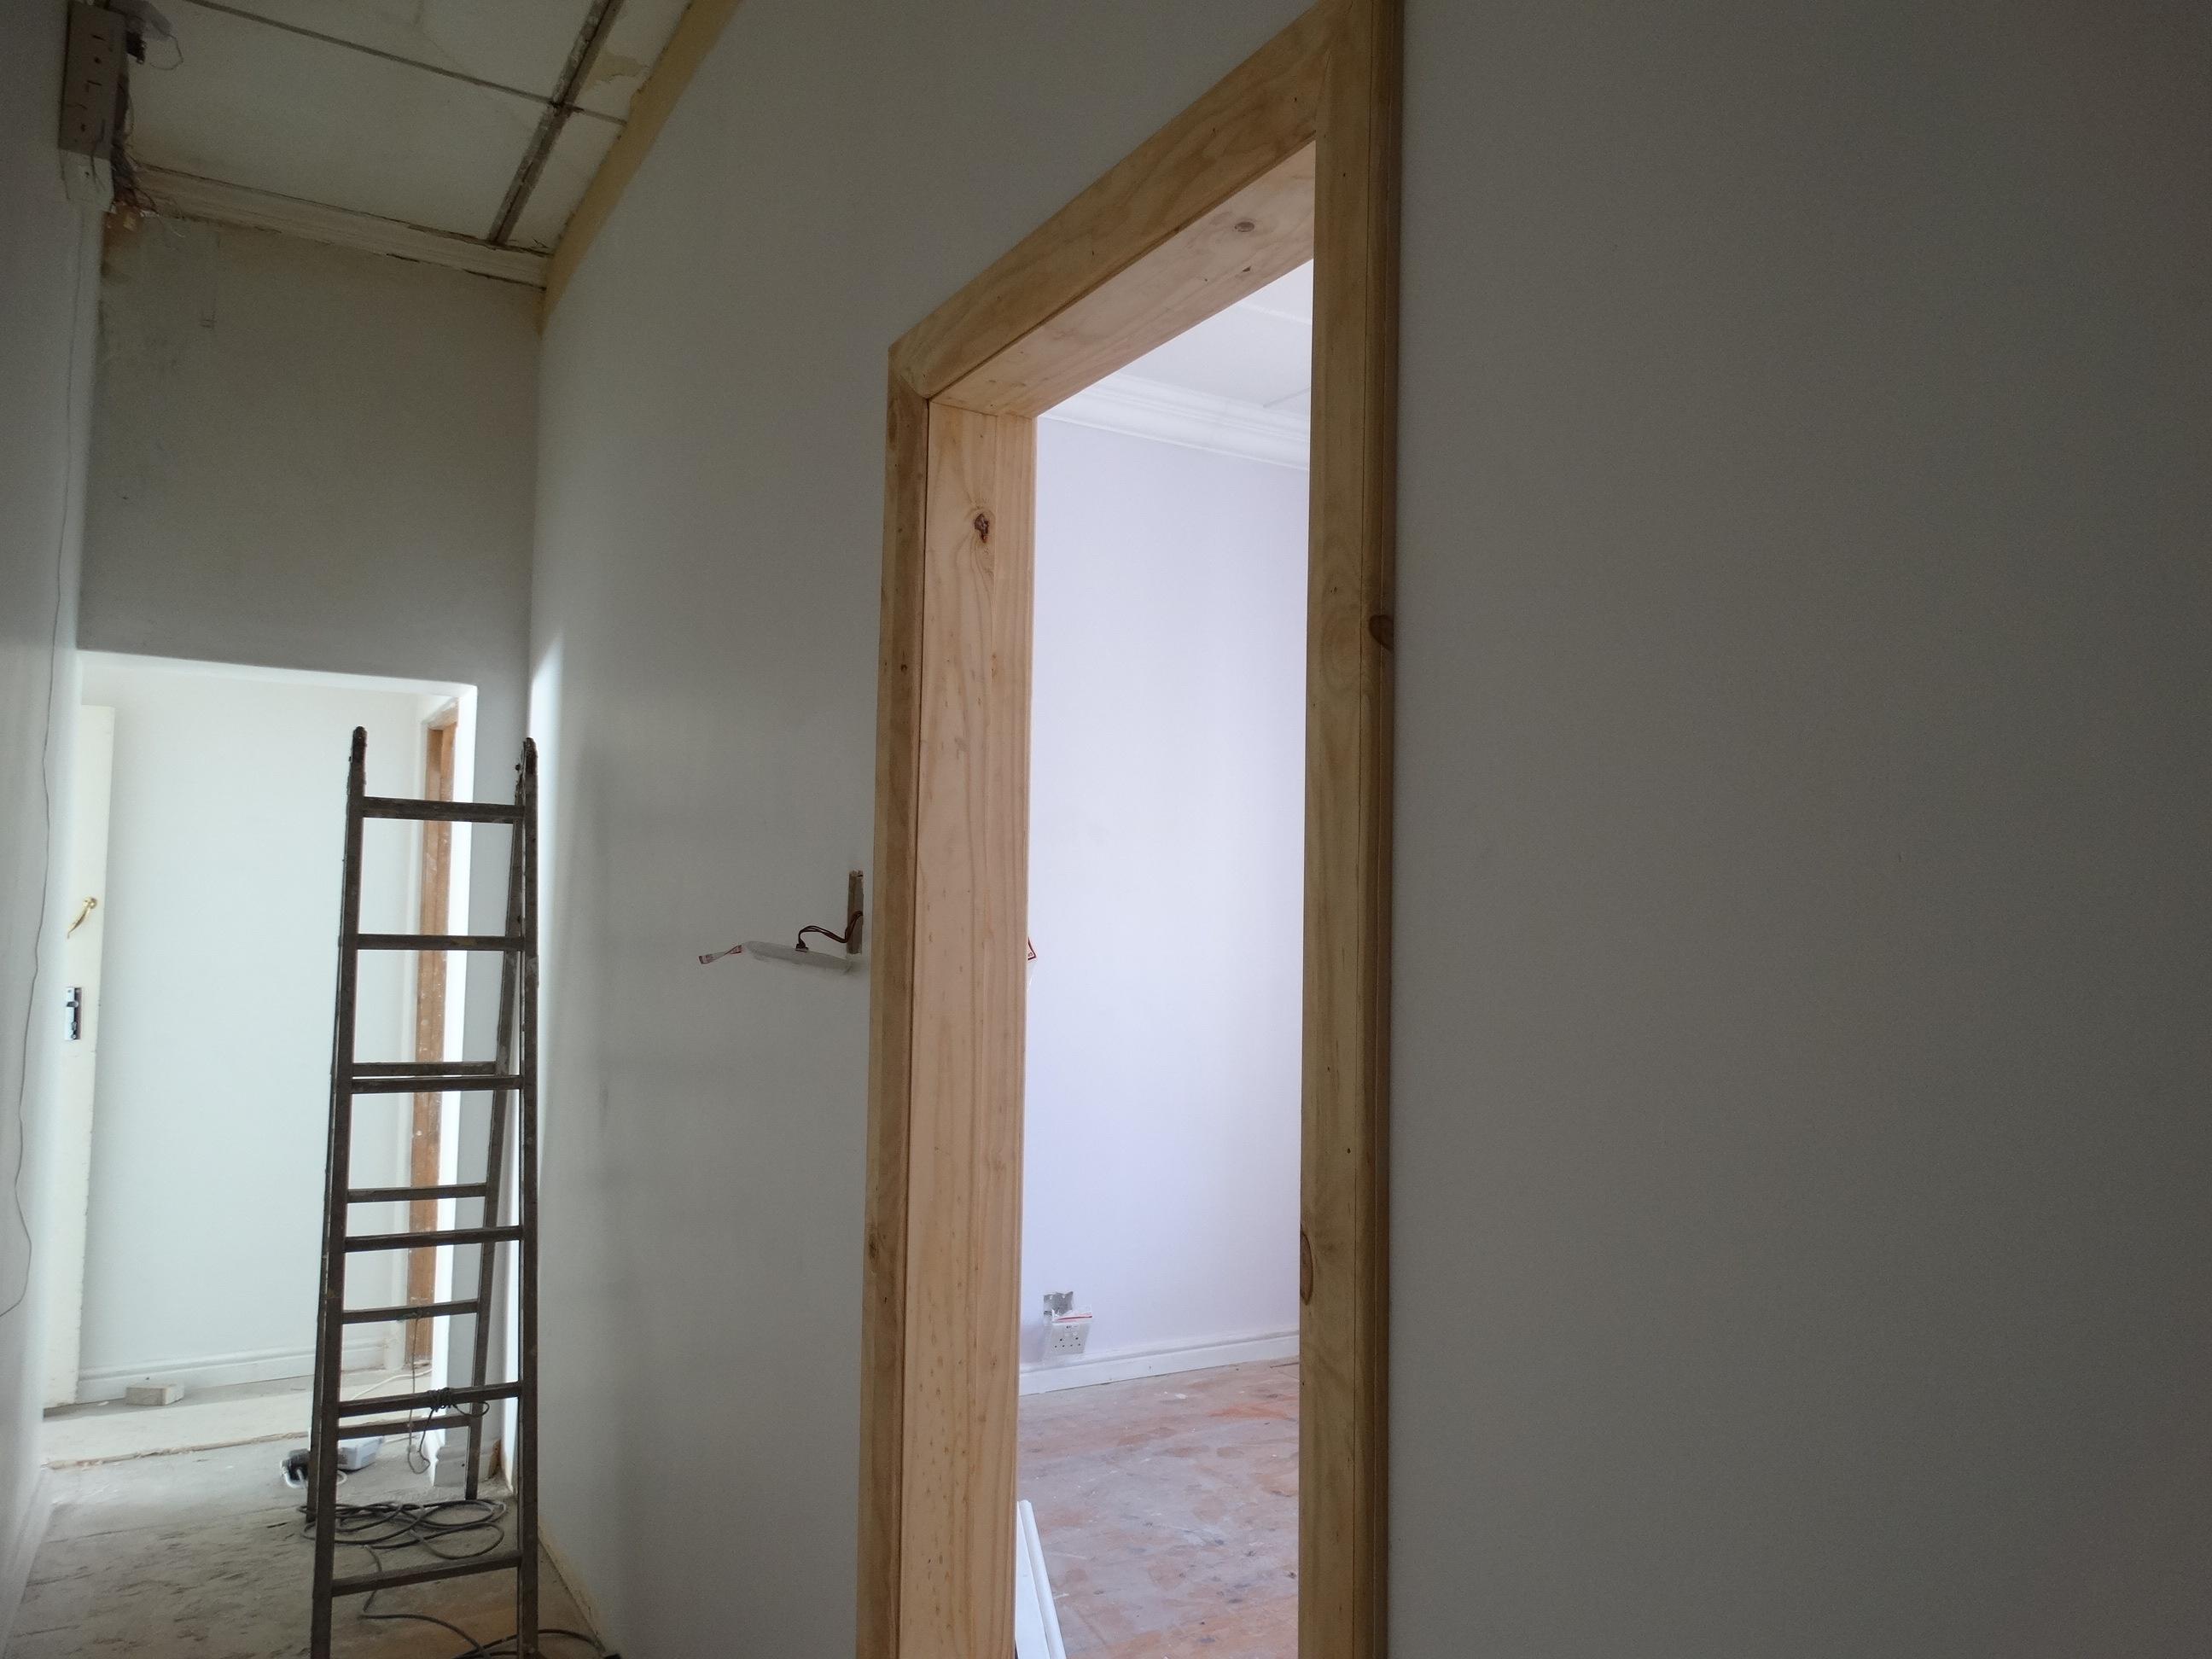 Architrave door frame